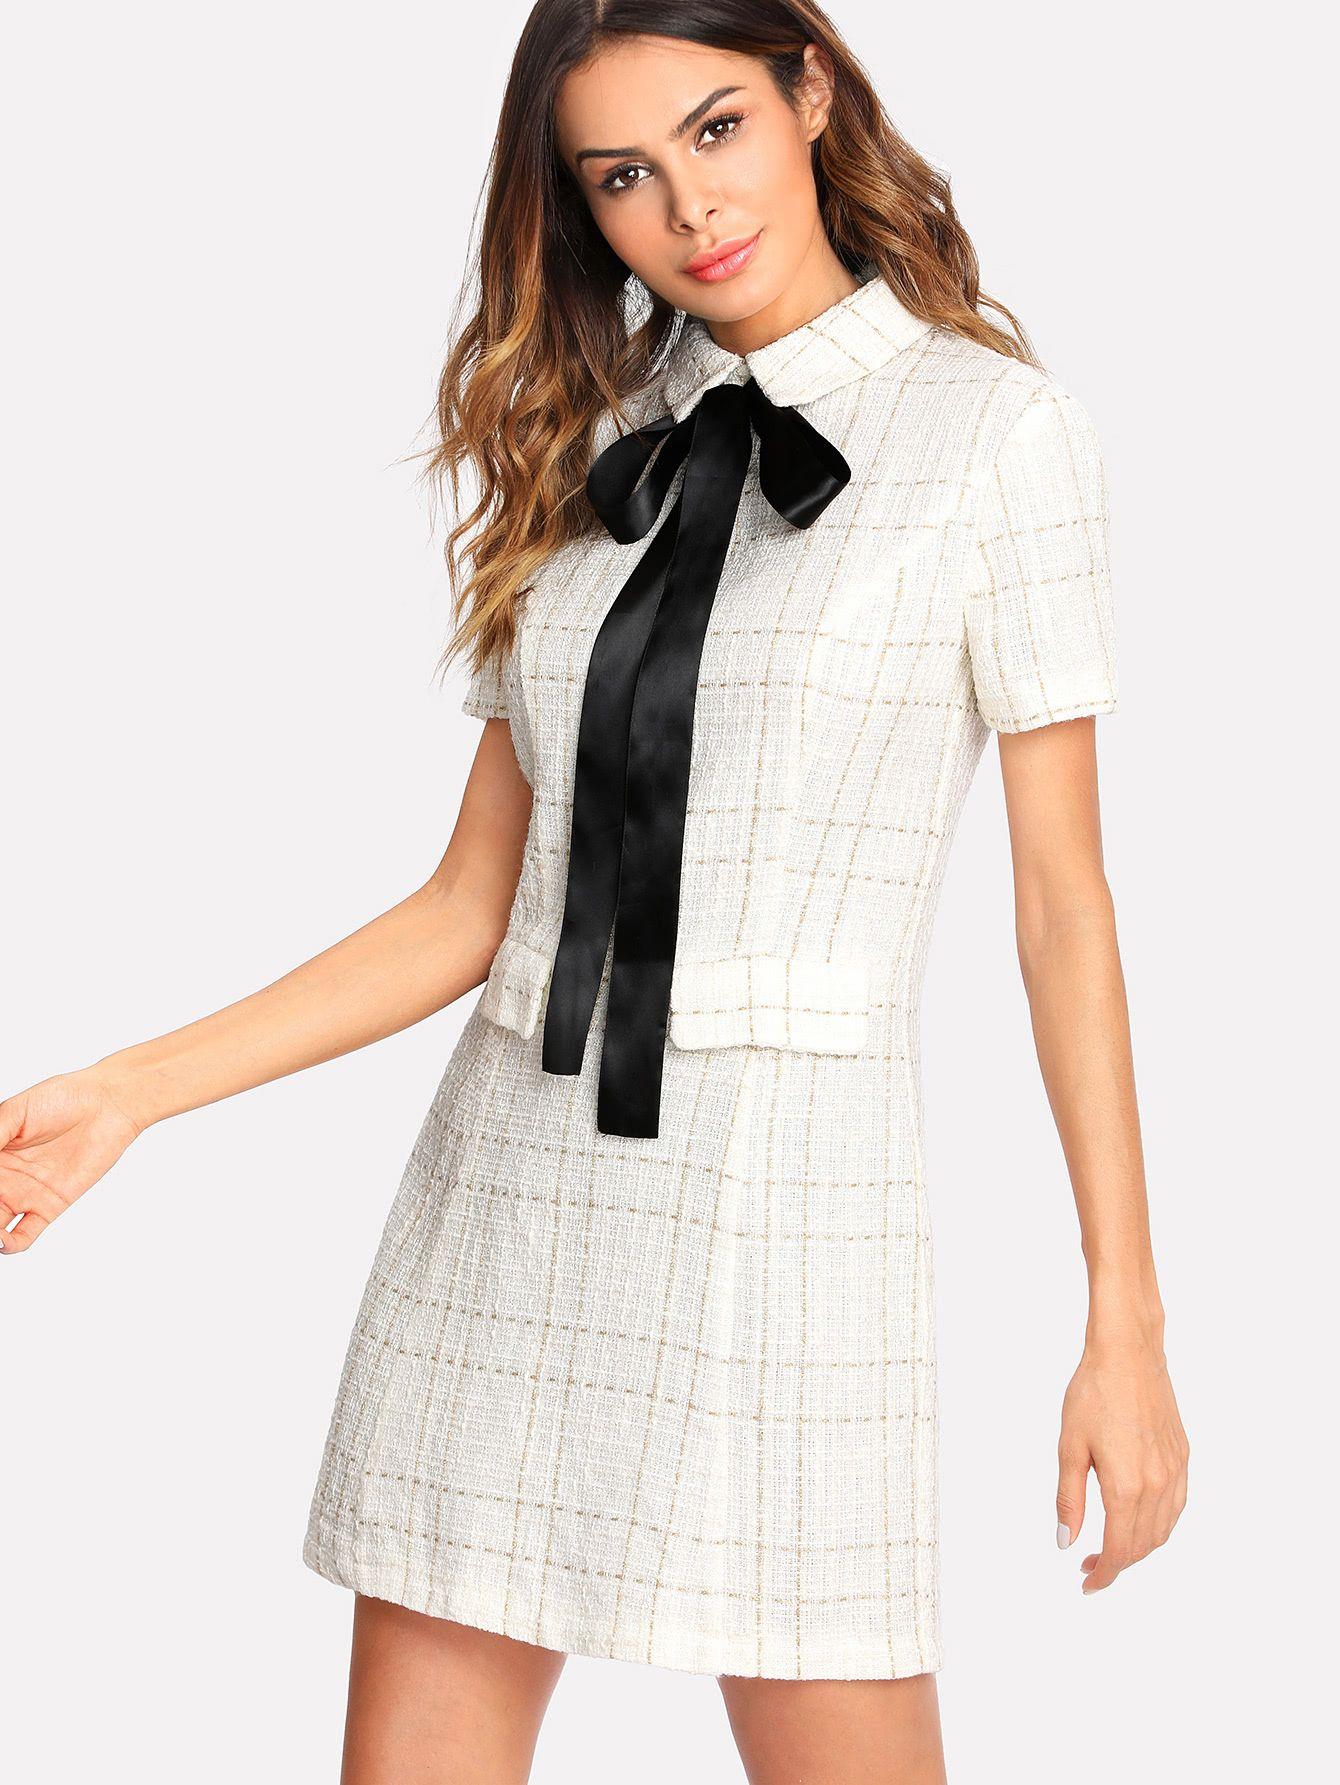 e6c14aff7d Shop Contrast Tie Neck Faux Pocket Tweed Dress online. SheIn offers Contrast  Tie Neck Faux Pocket Tweed Dress & more to fit your fashionable needs.